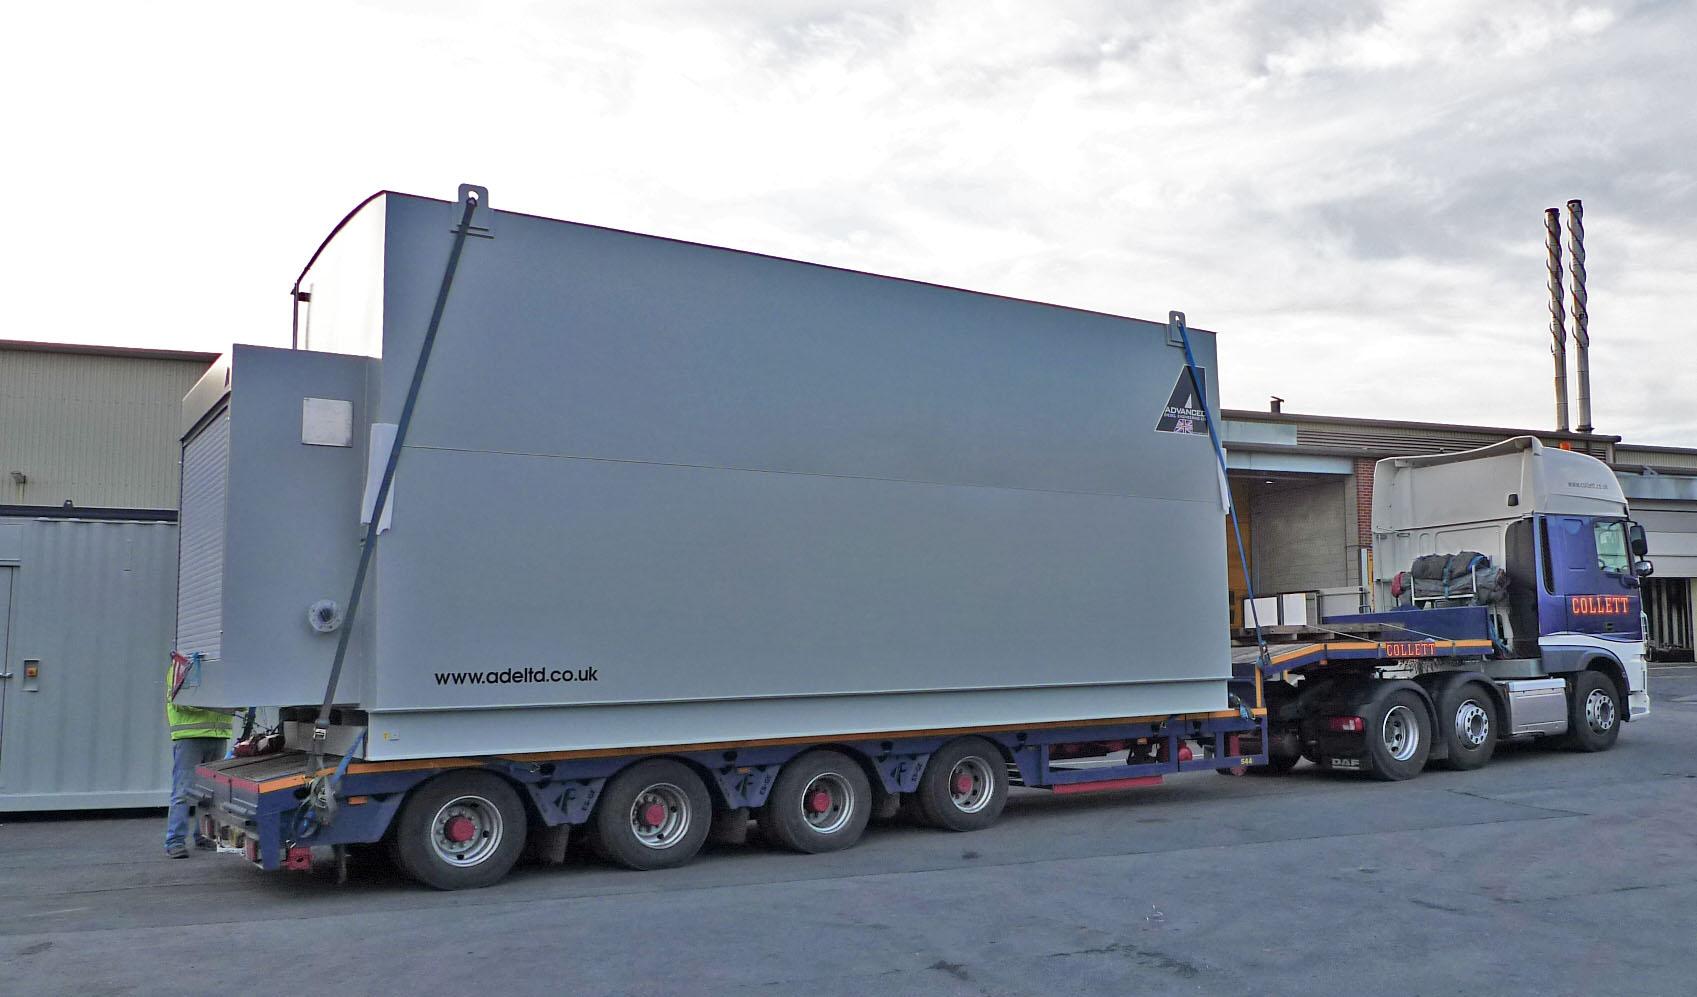 67,000 Litre double skinned bulk fuel tank